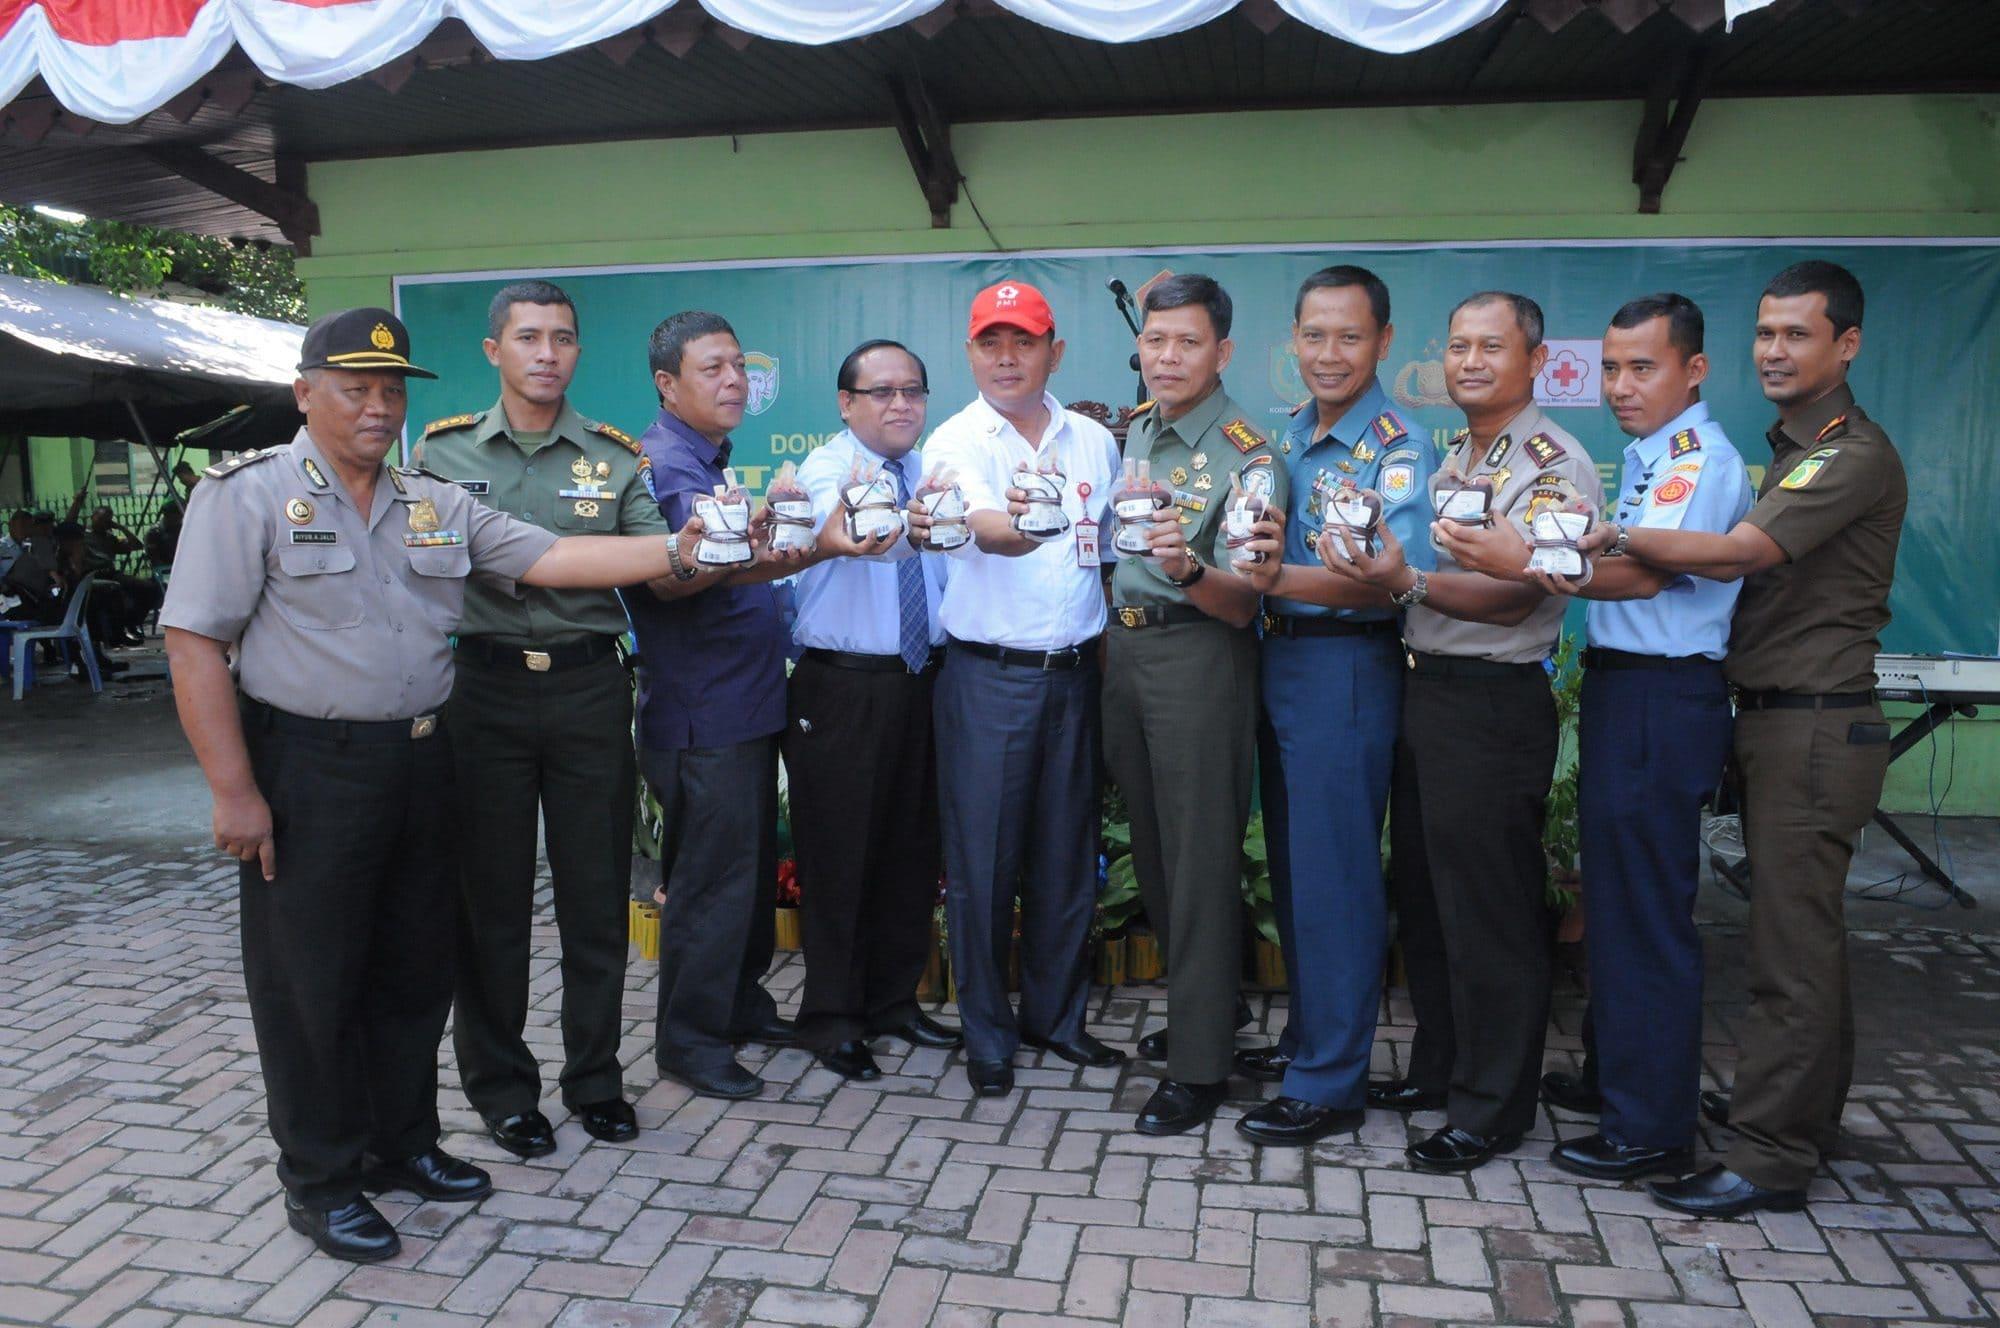 KOREM 011/LW GELAR KEGIATAN BAKTI SOSIAL DONOR DARAH DALAM RANGKA MEMPERINGATI HUT KE–69 TNI